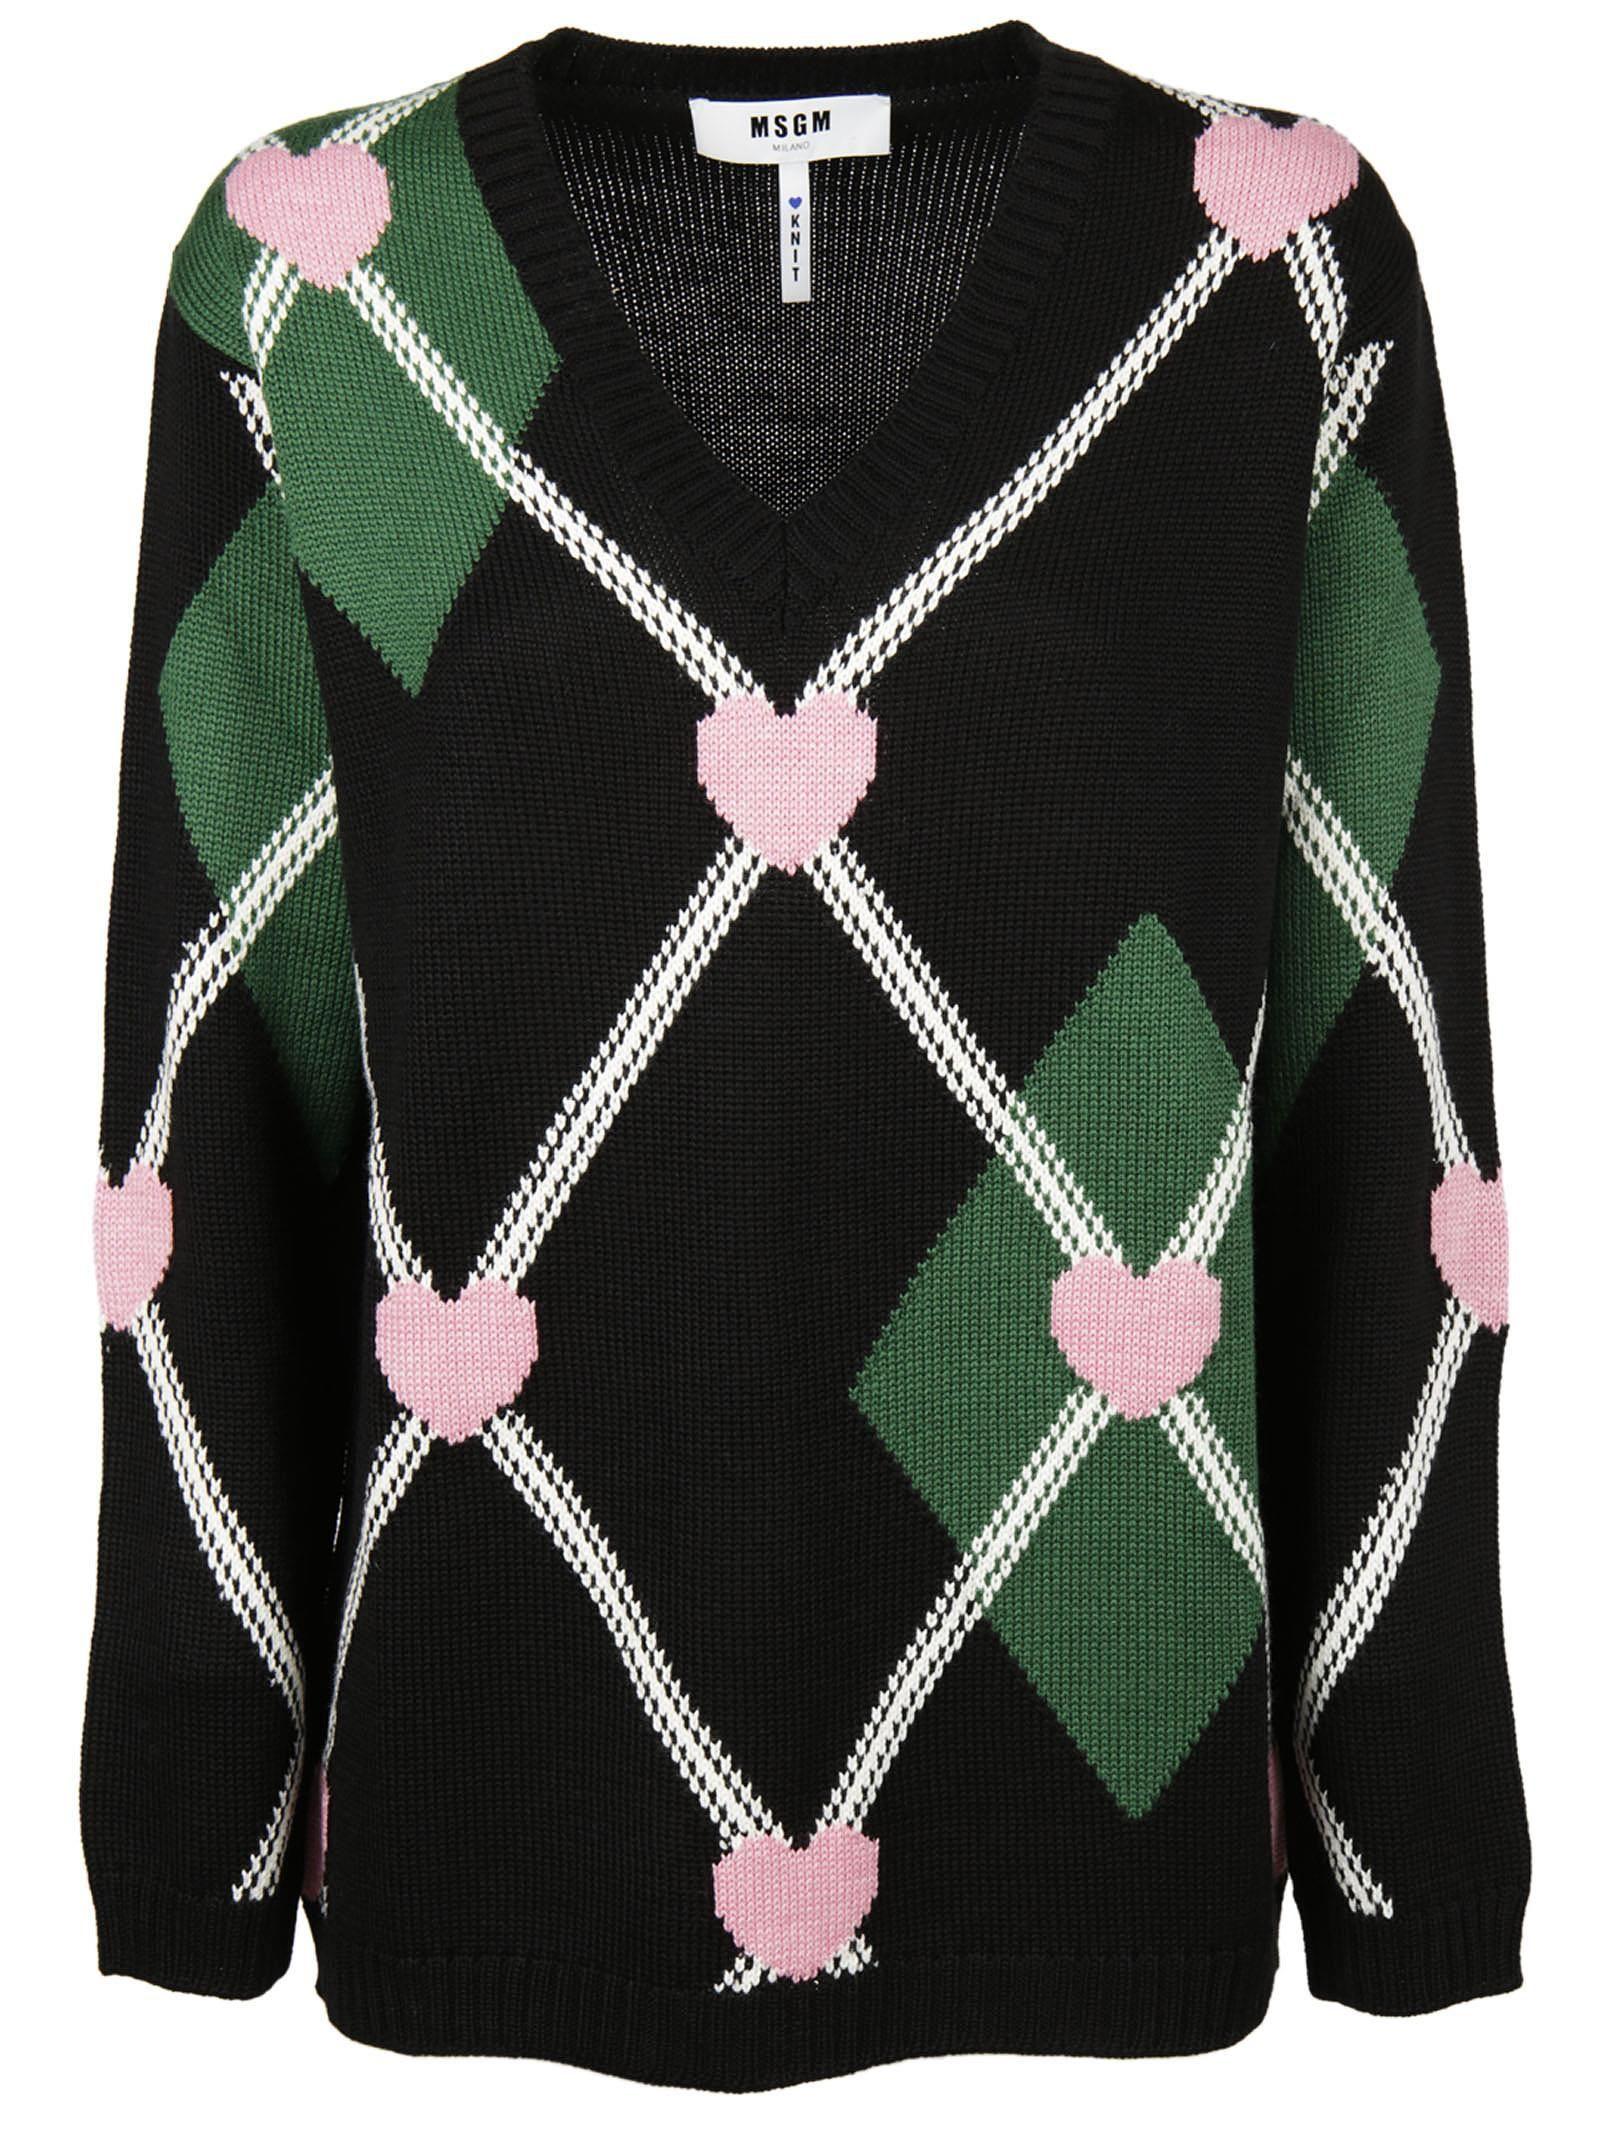 Msgm Heart Intarsia Sweater